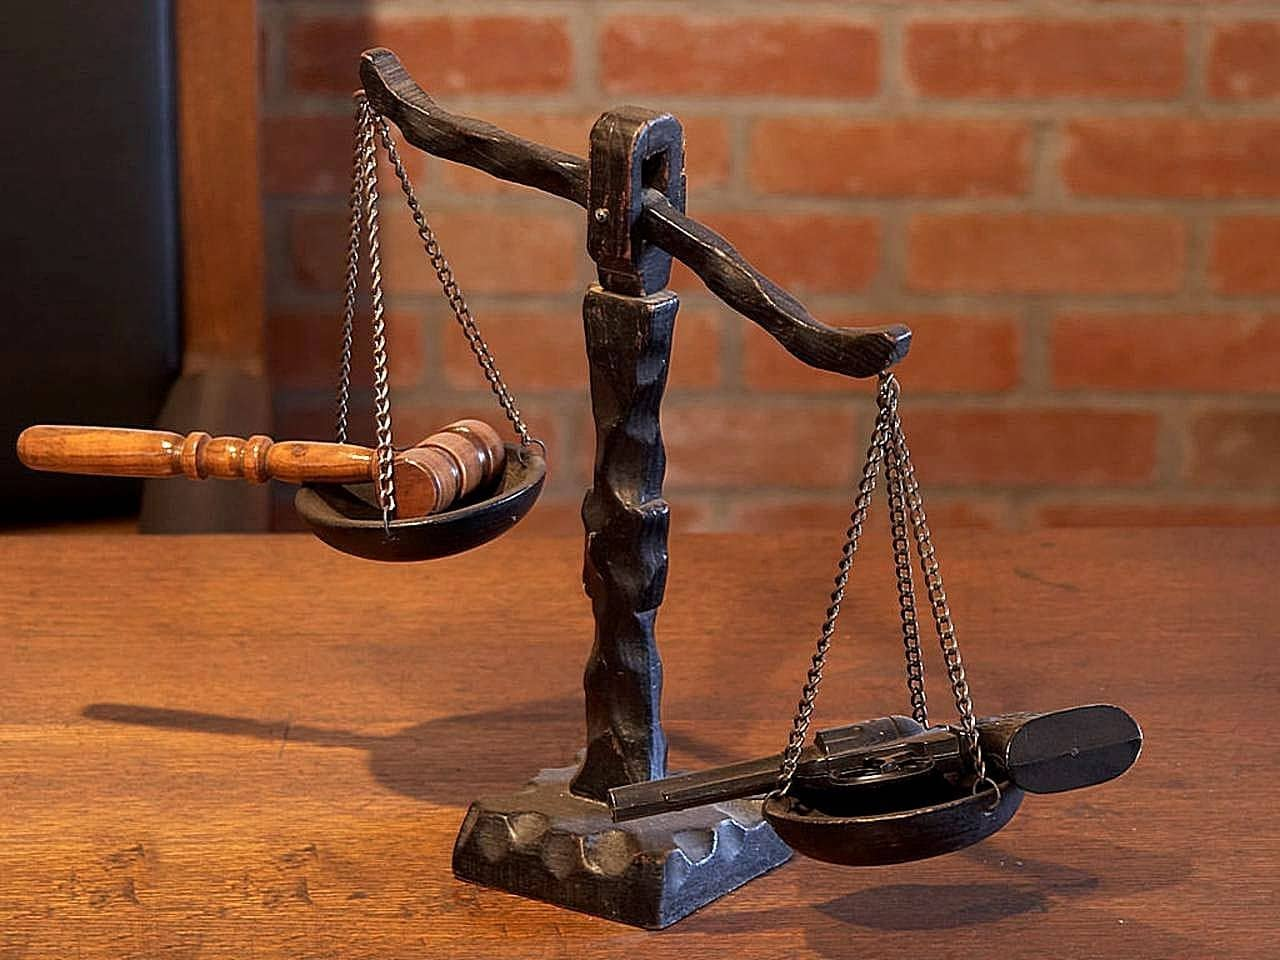 justice align